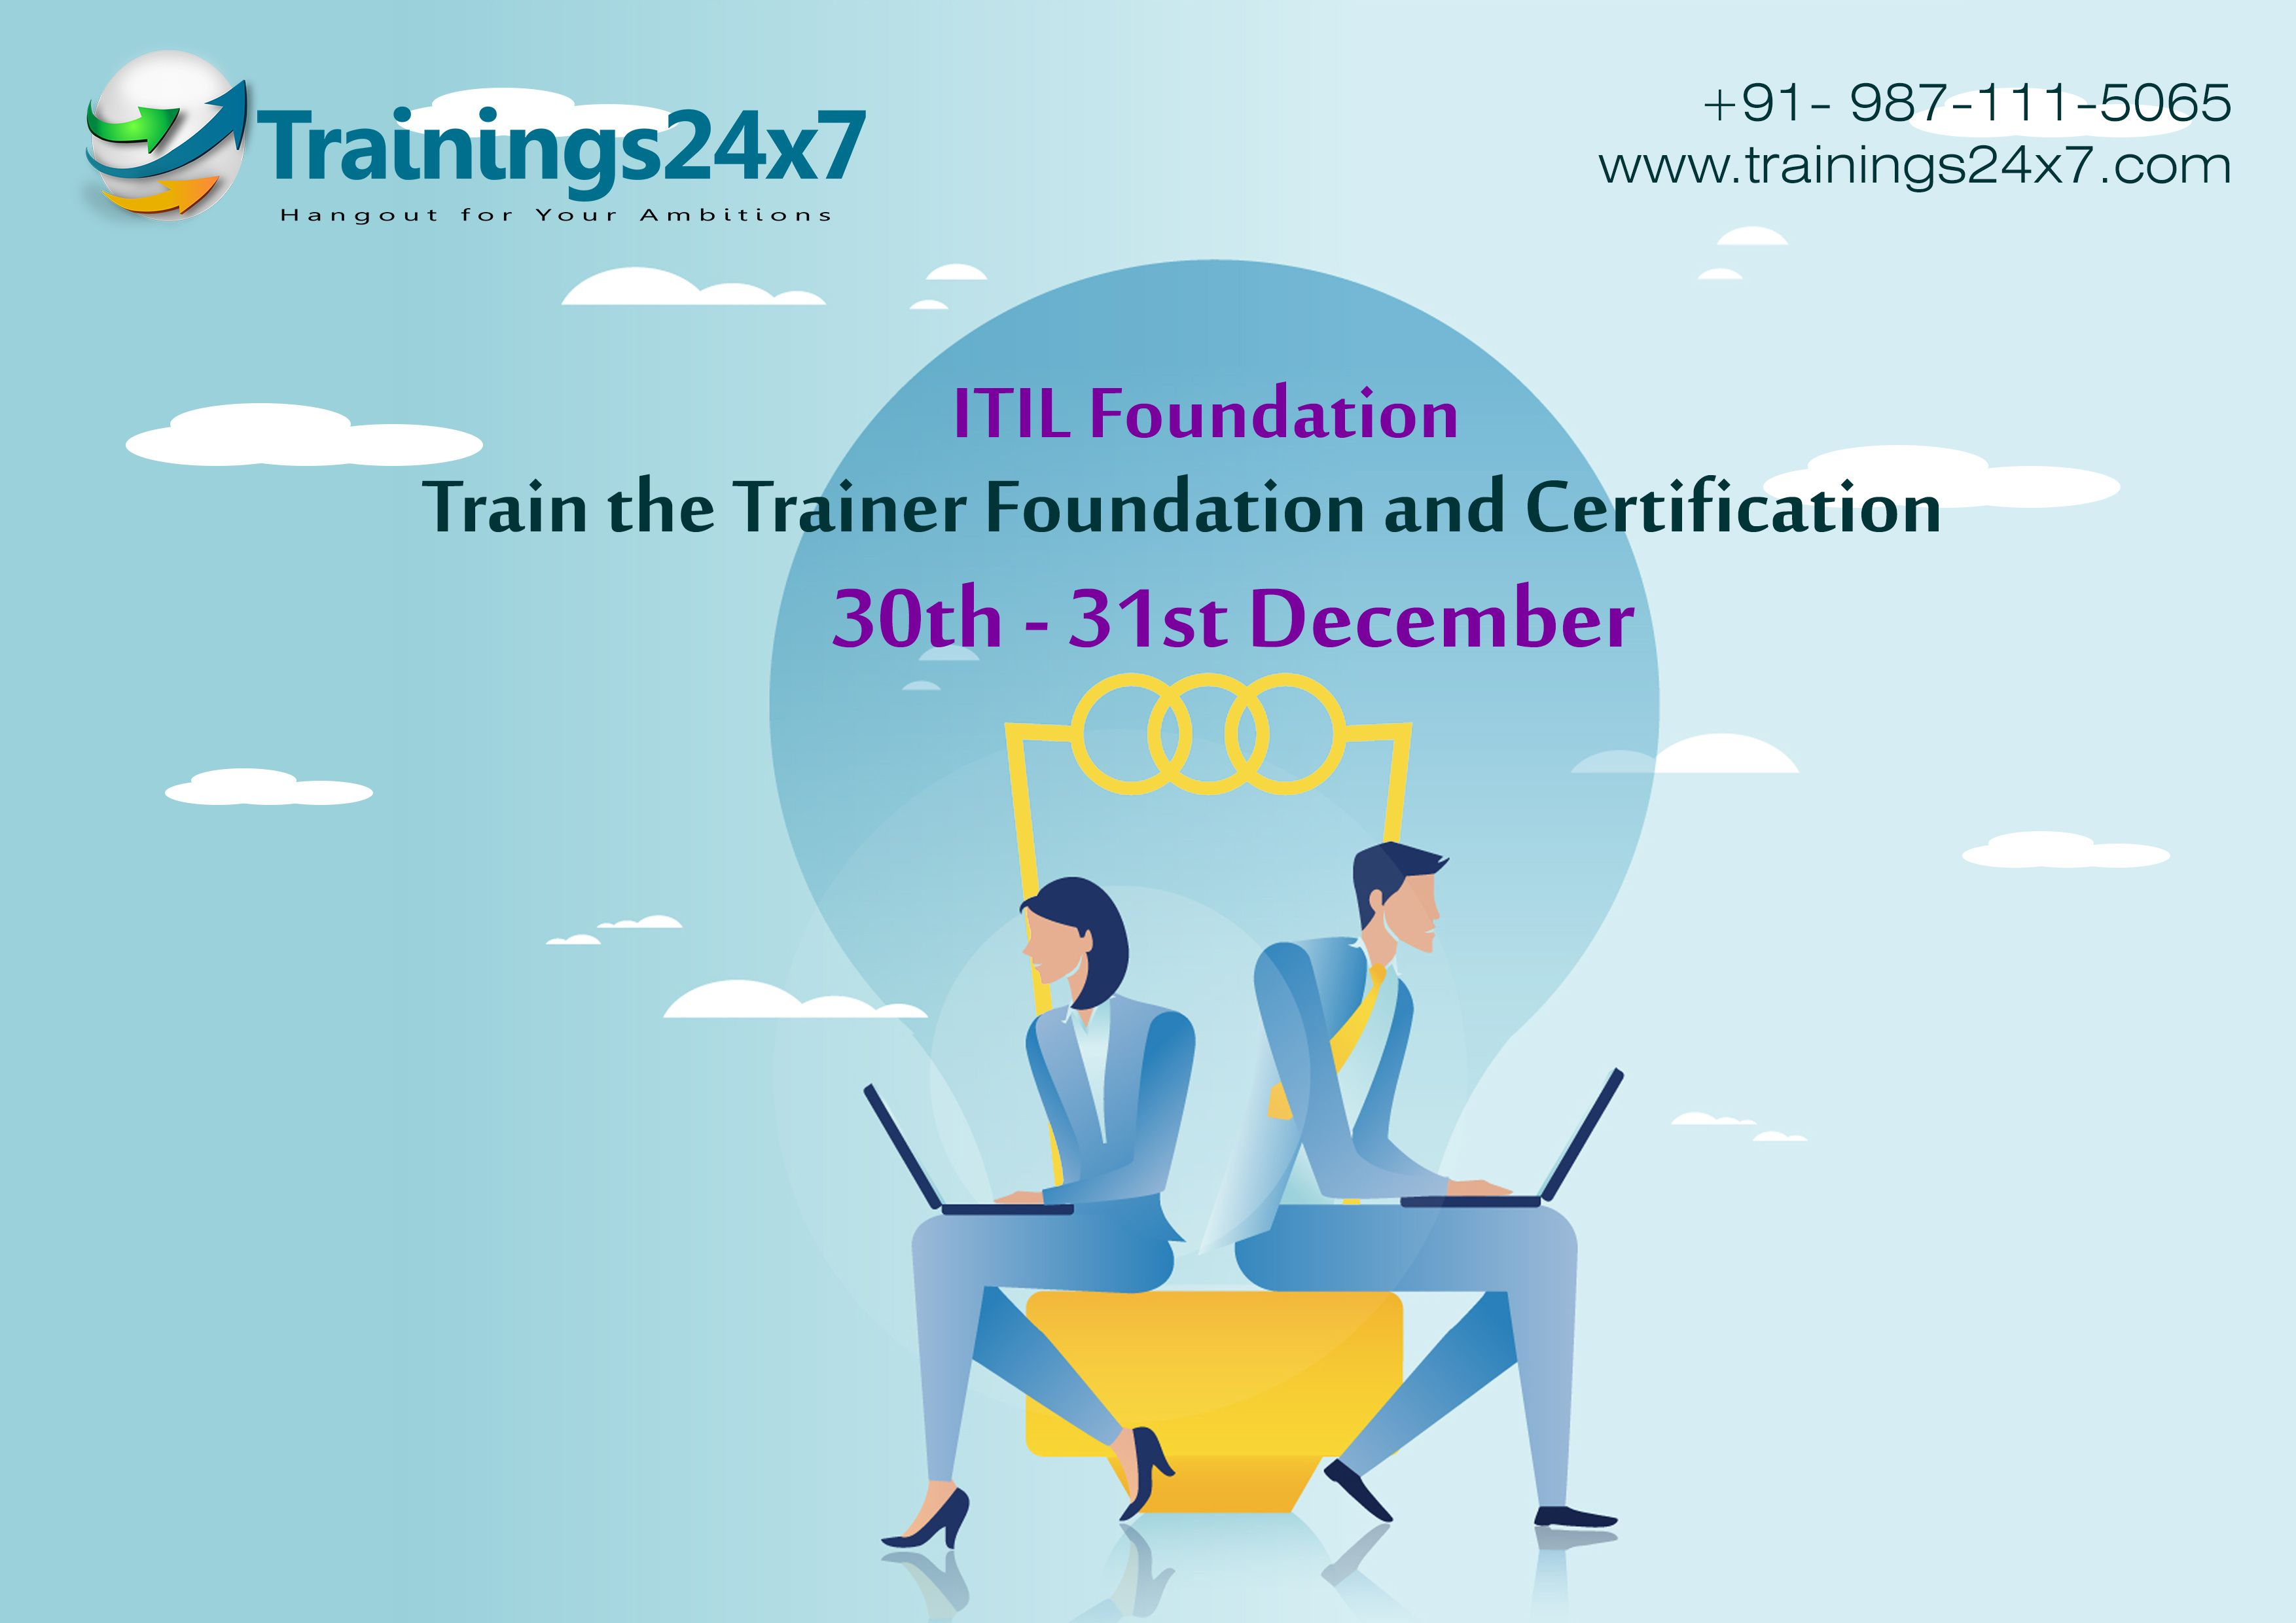 Happy New Year Celebration 2017 Trainings24x7 Is Providing Itil